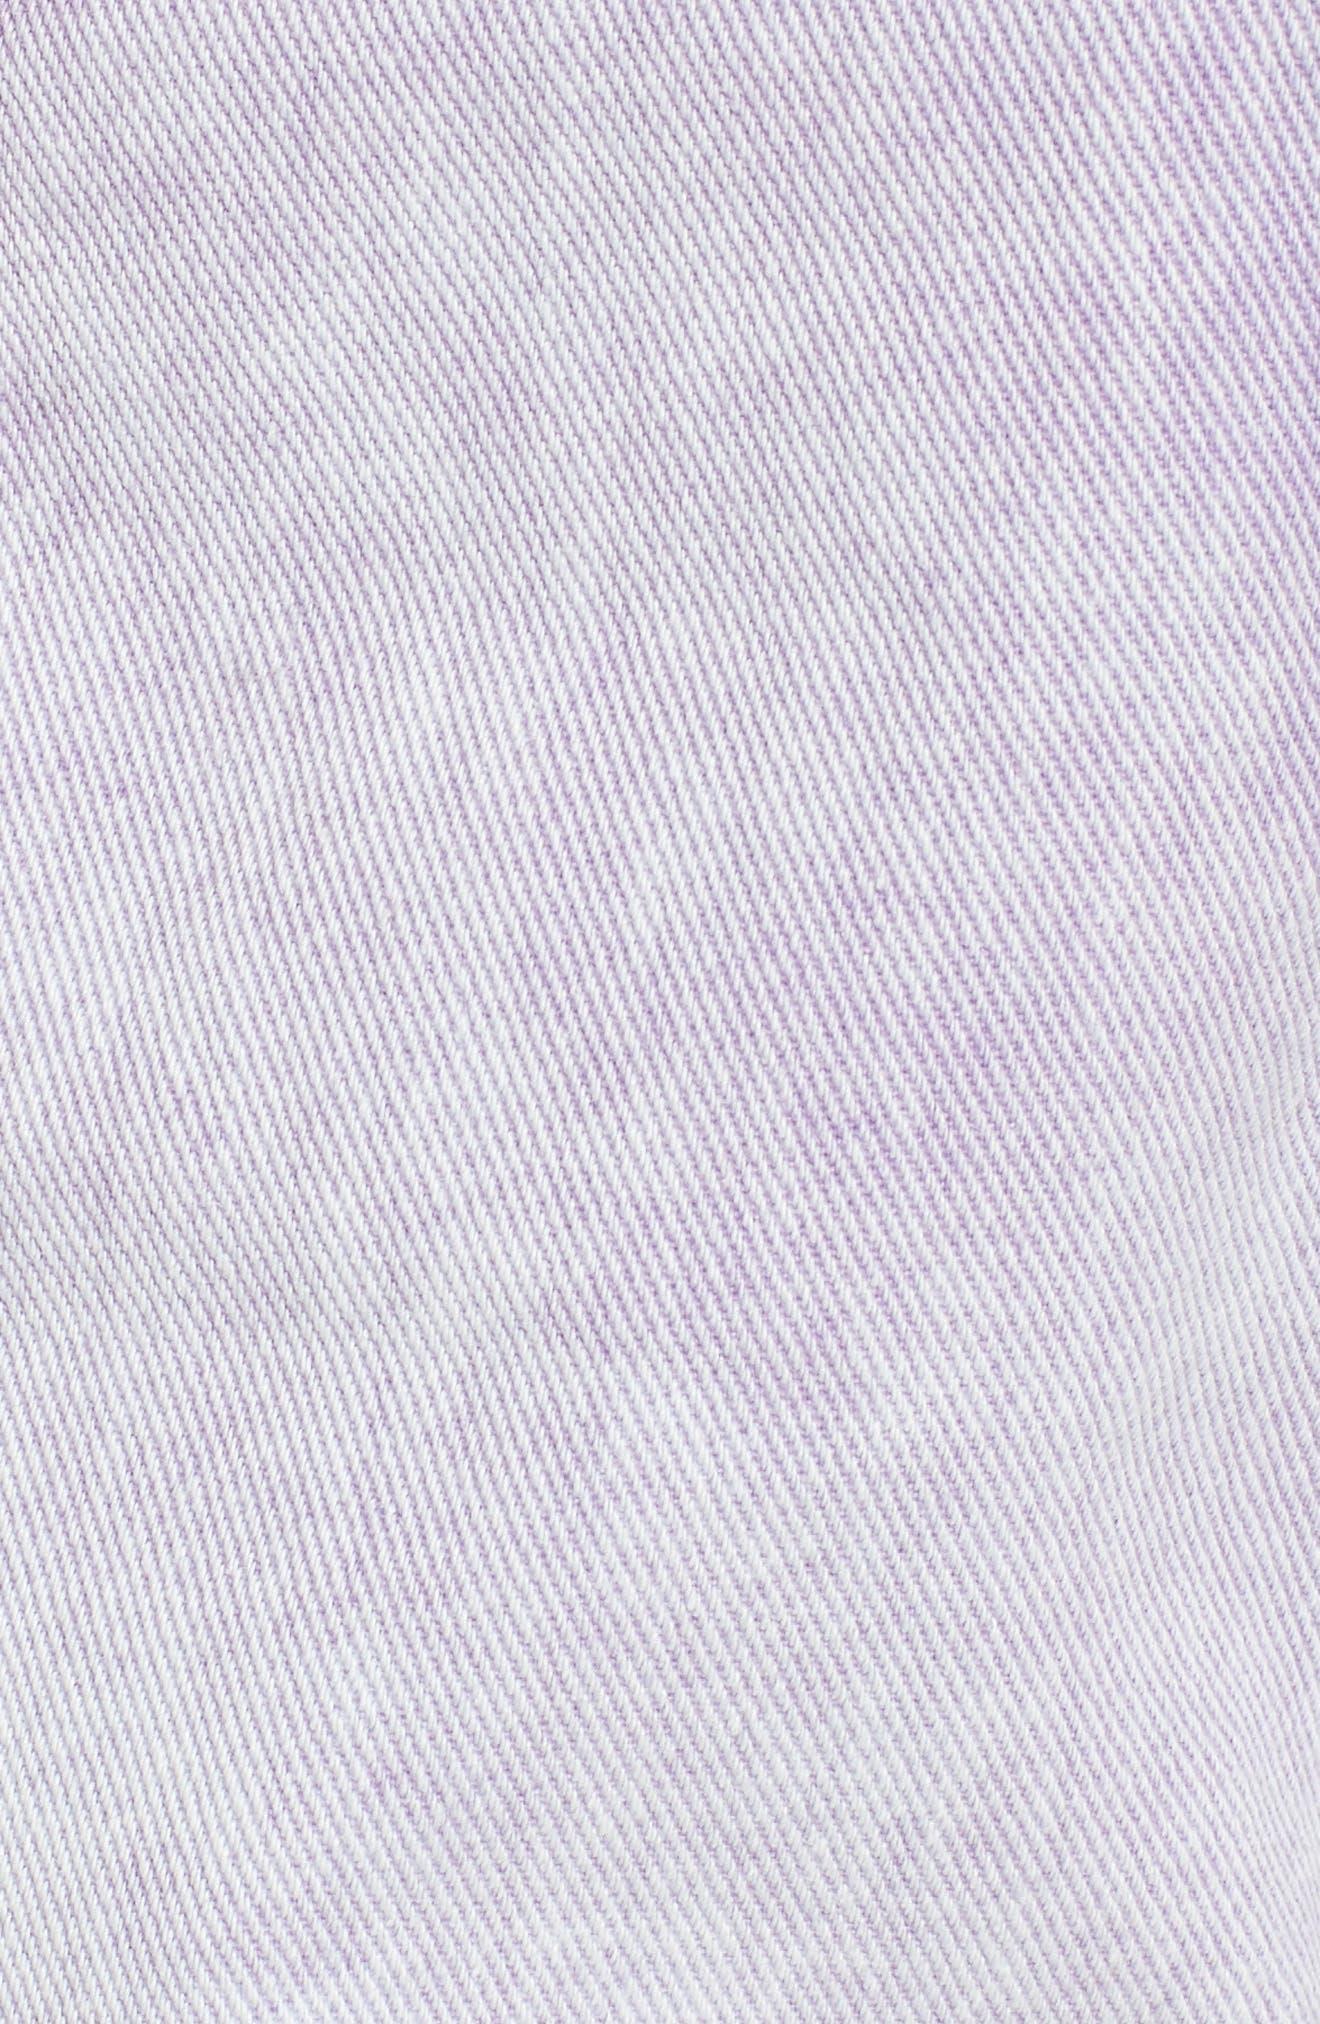 Unionbay Devo Acid Wash Denim Shorts,                             Alternate thumbnail 5, color,                             Ultra Lilac